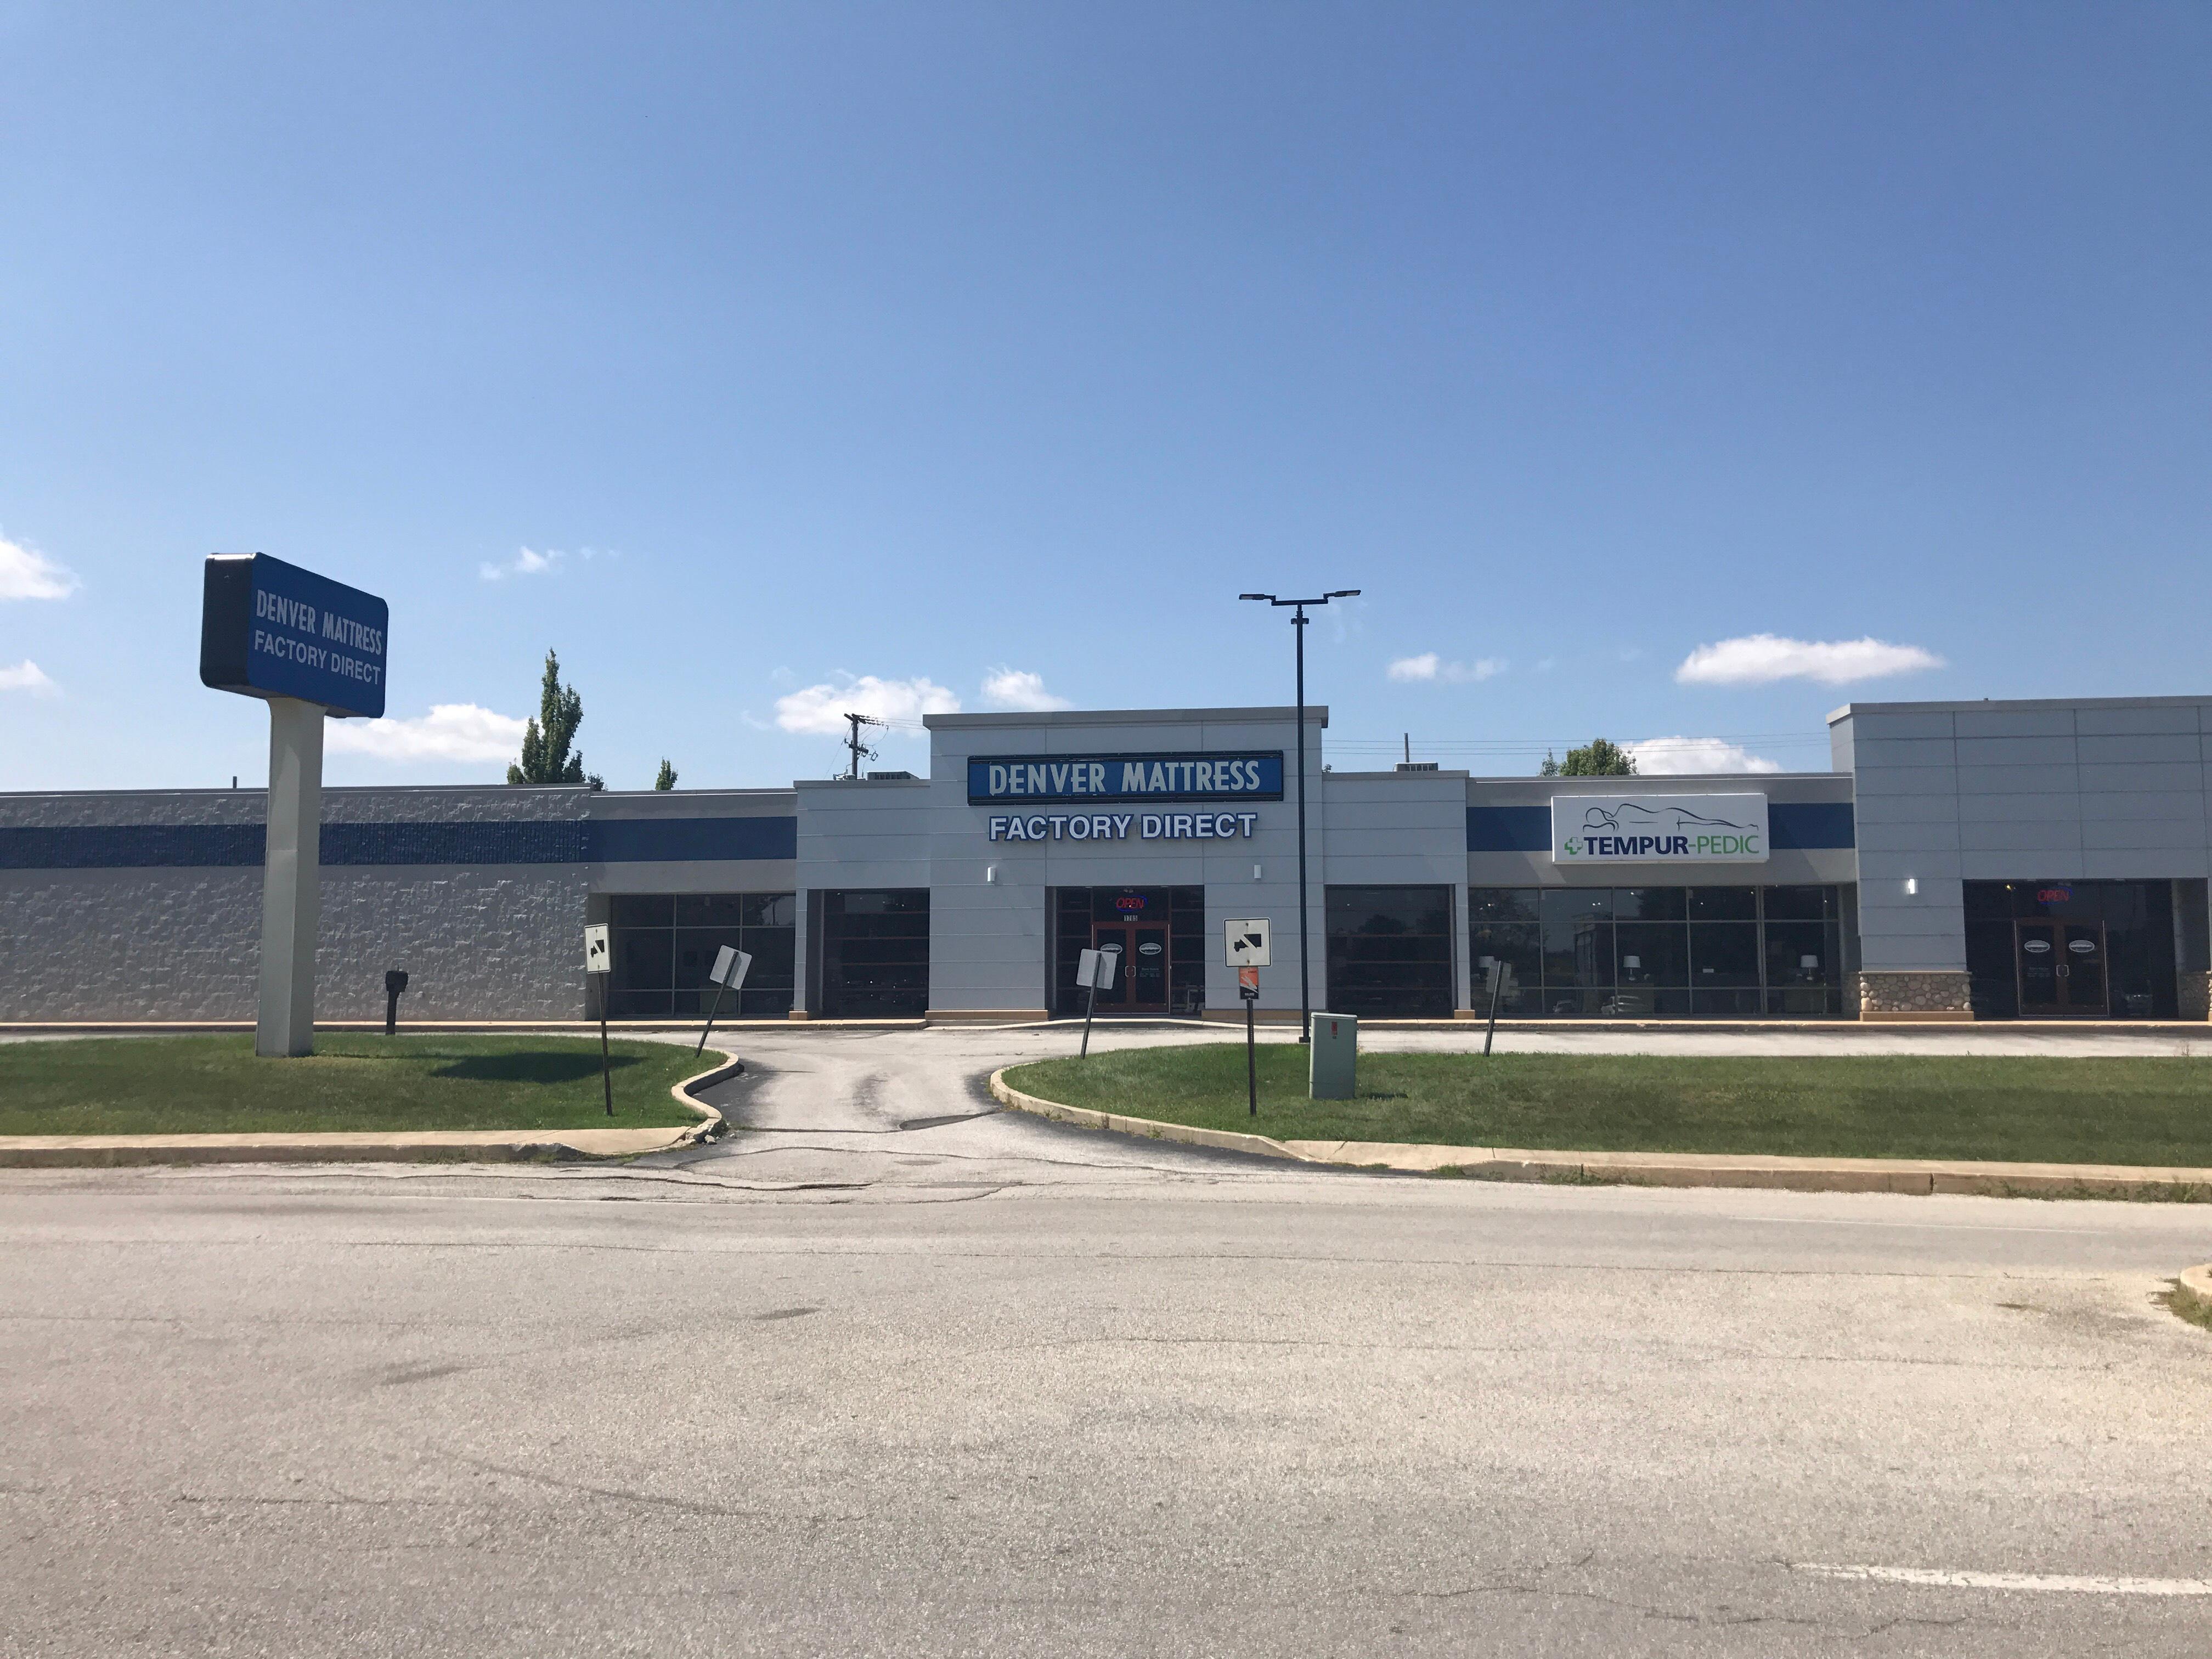 Denver Mattress Company image 11